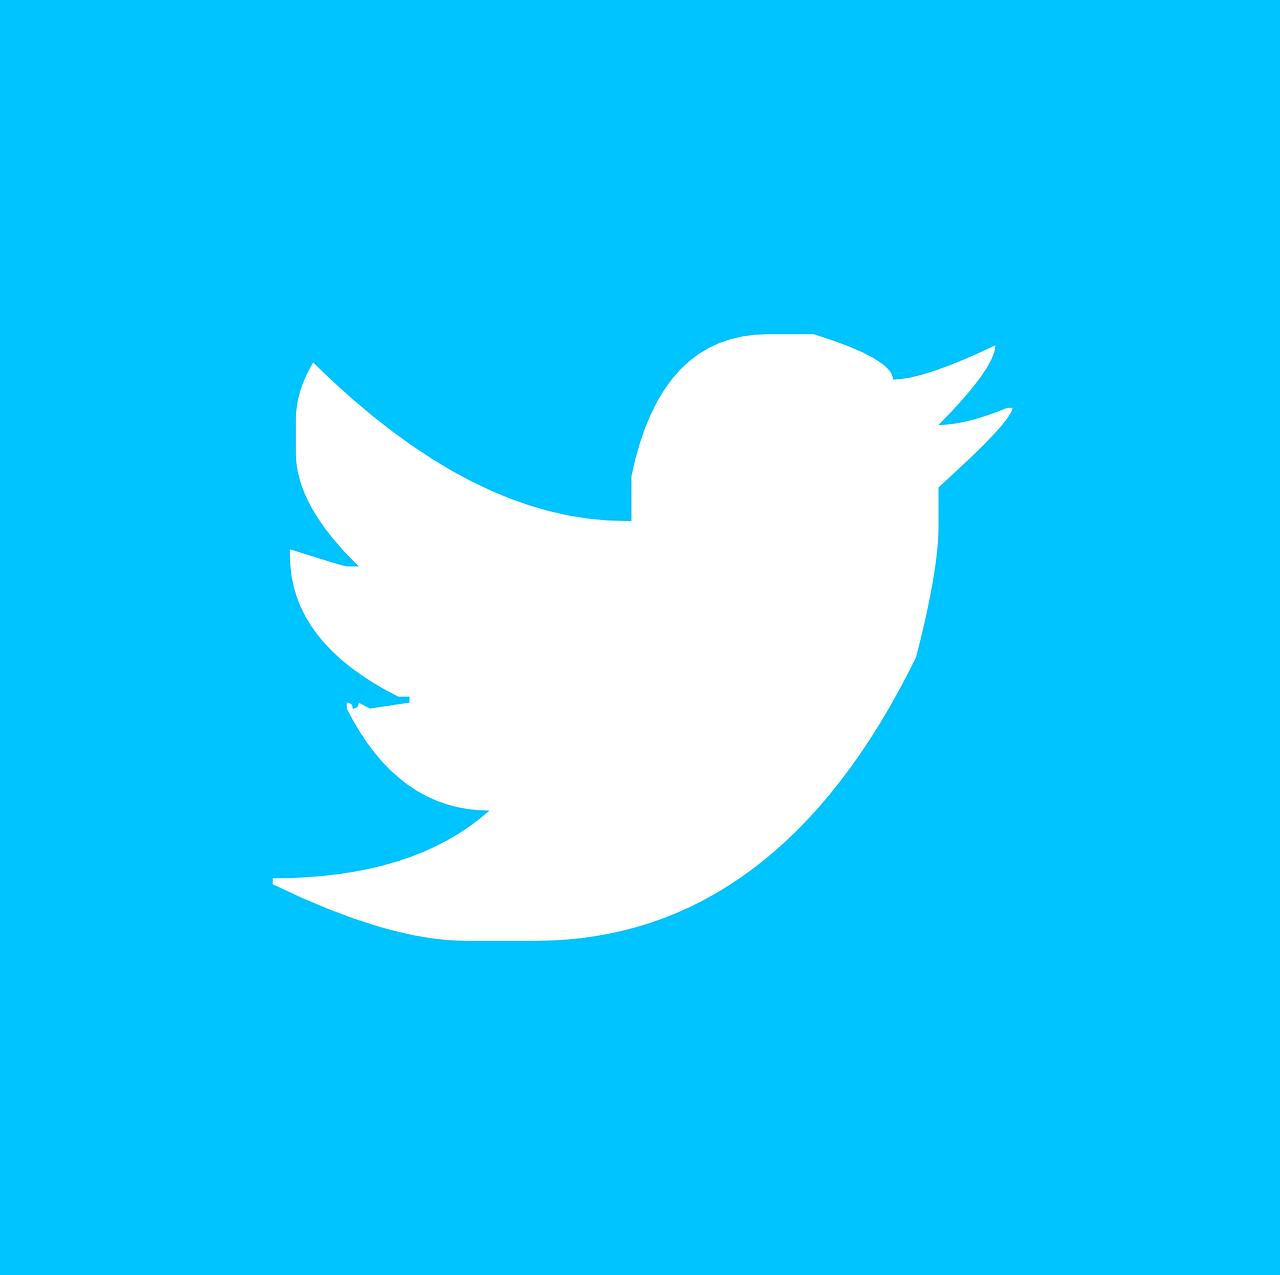 Twitter11.23